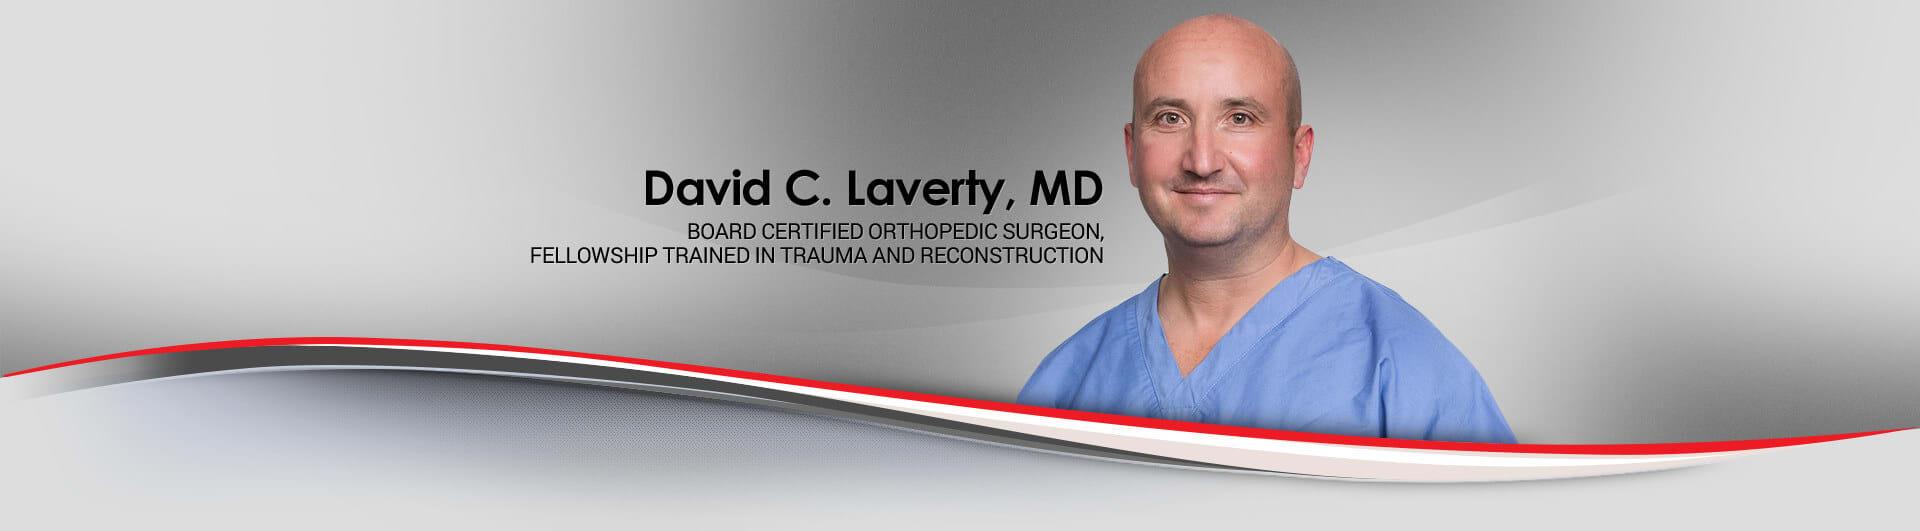 Dr. David C Laverty MD